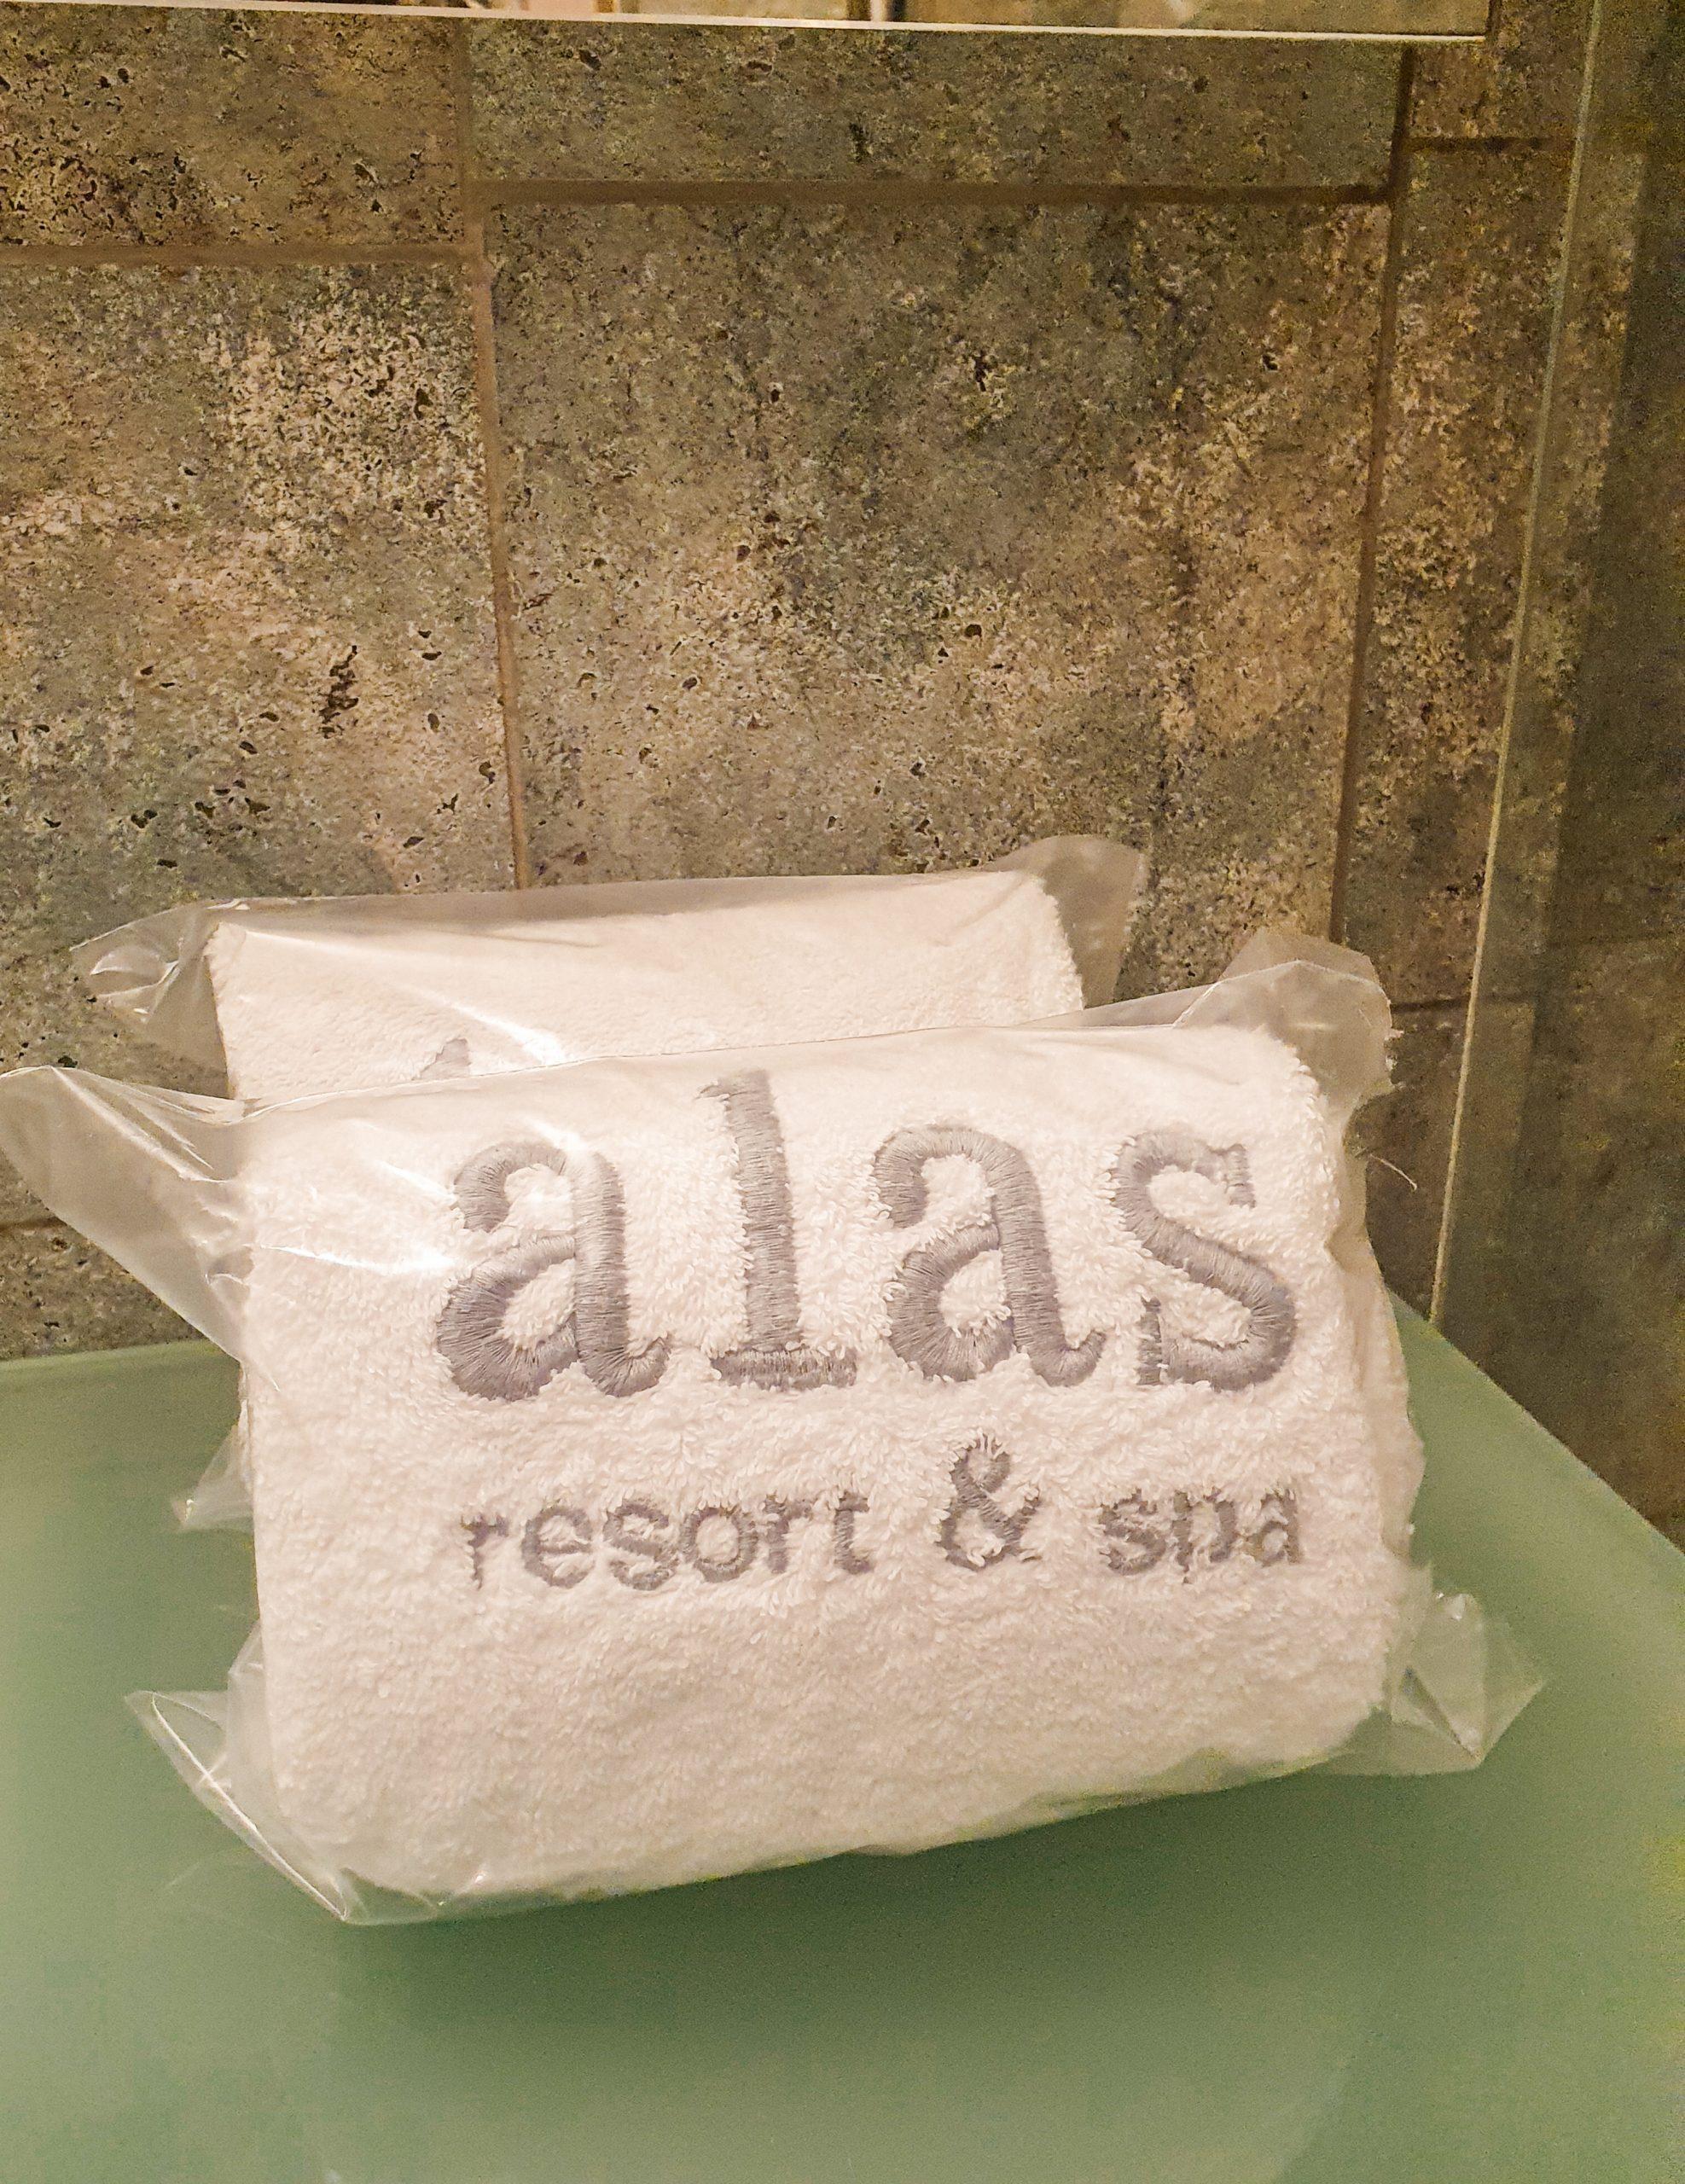 Alas Resort & Spa towels